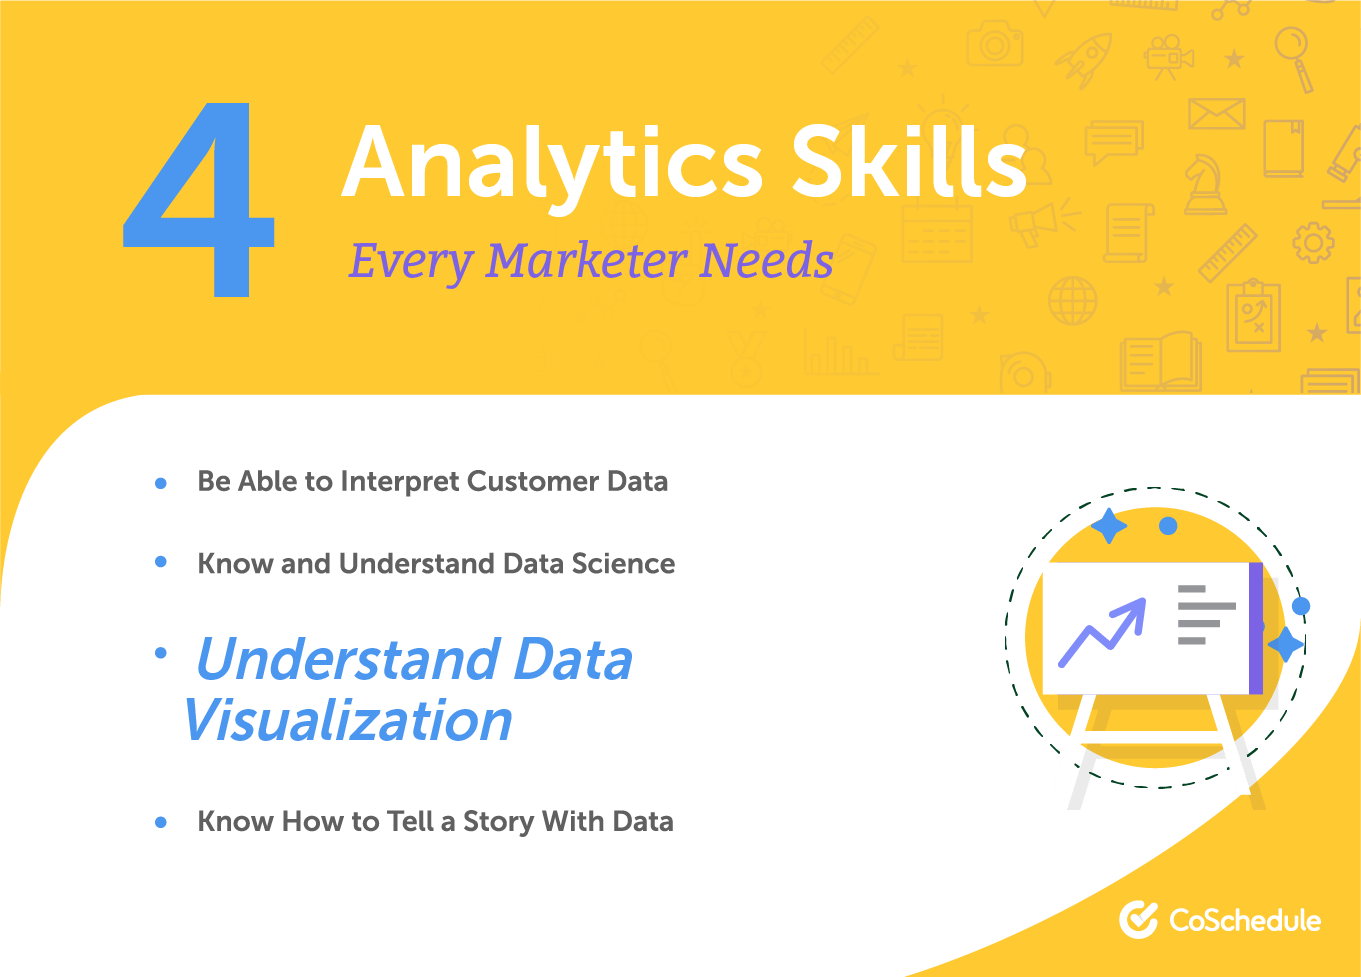 4 analytics skills every marketer needs.